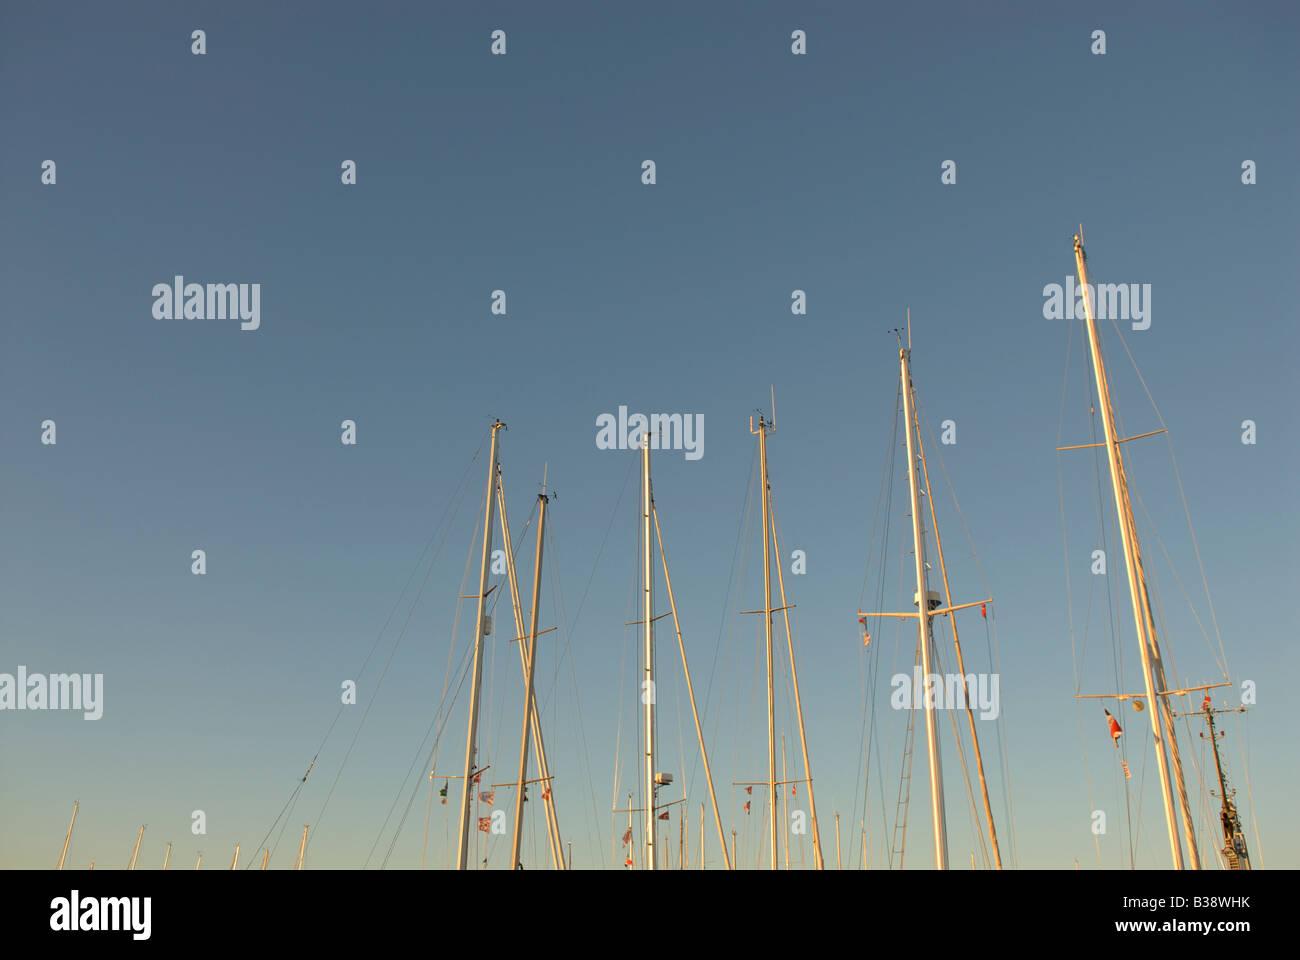 SHIP MASTS - Stock Image